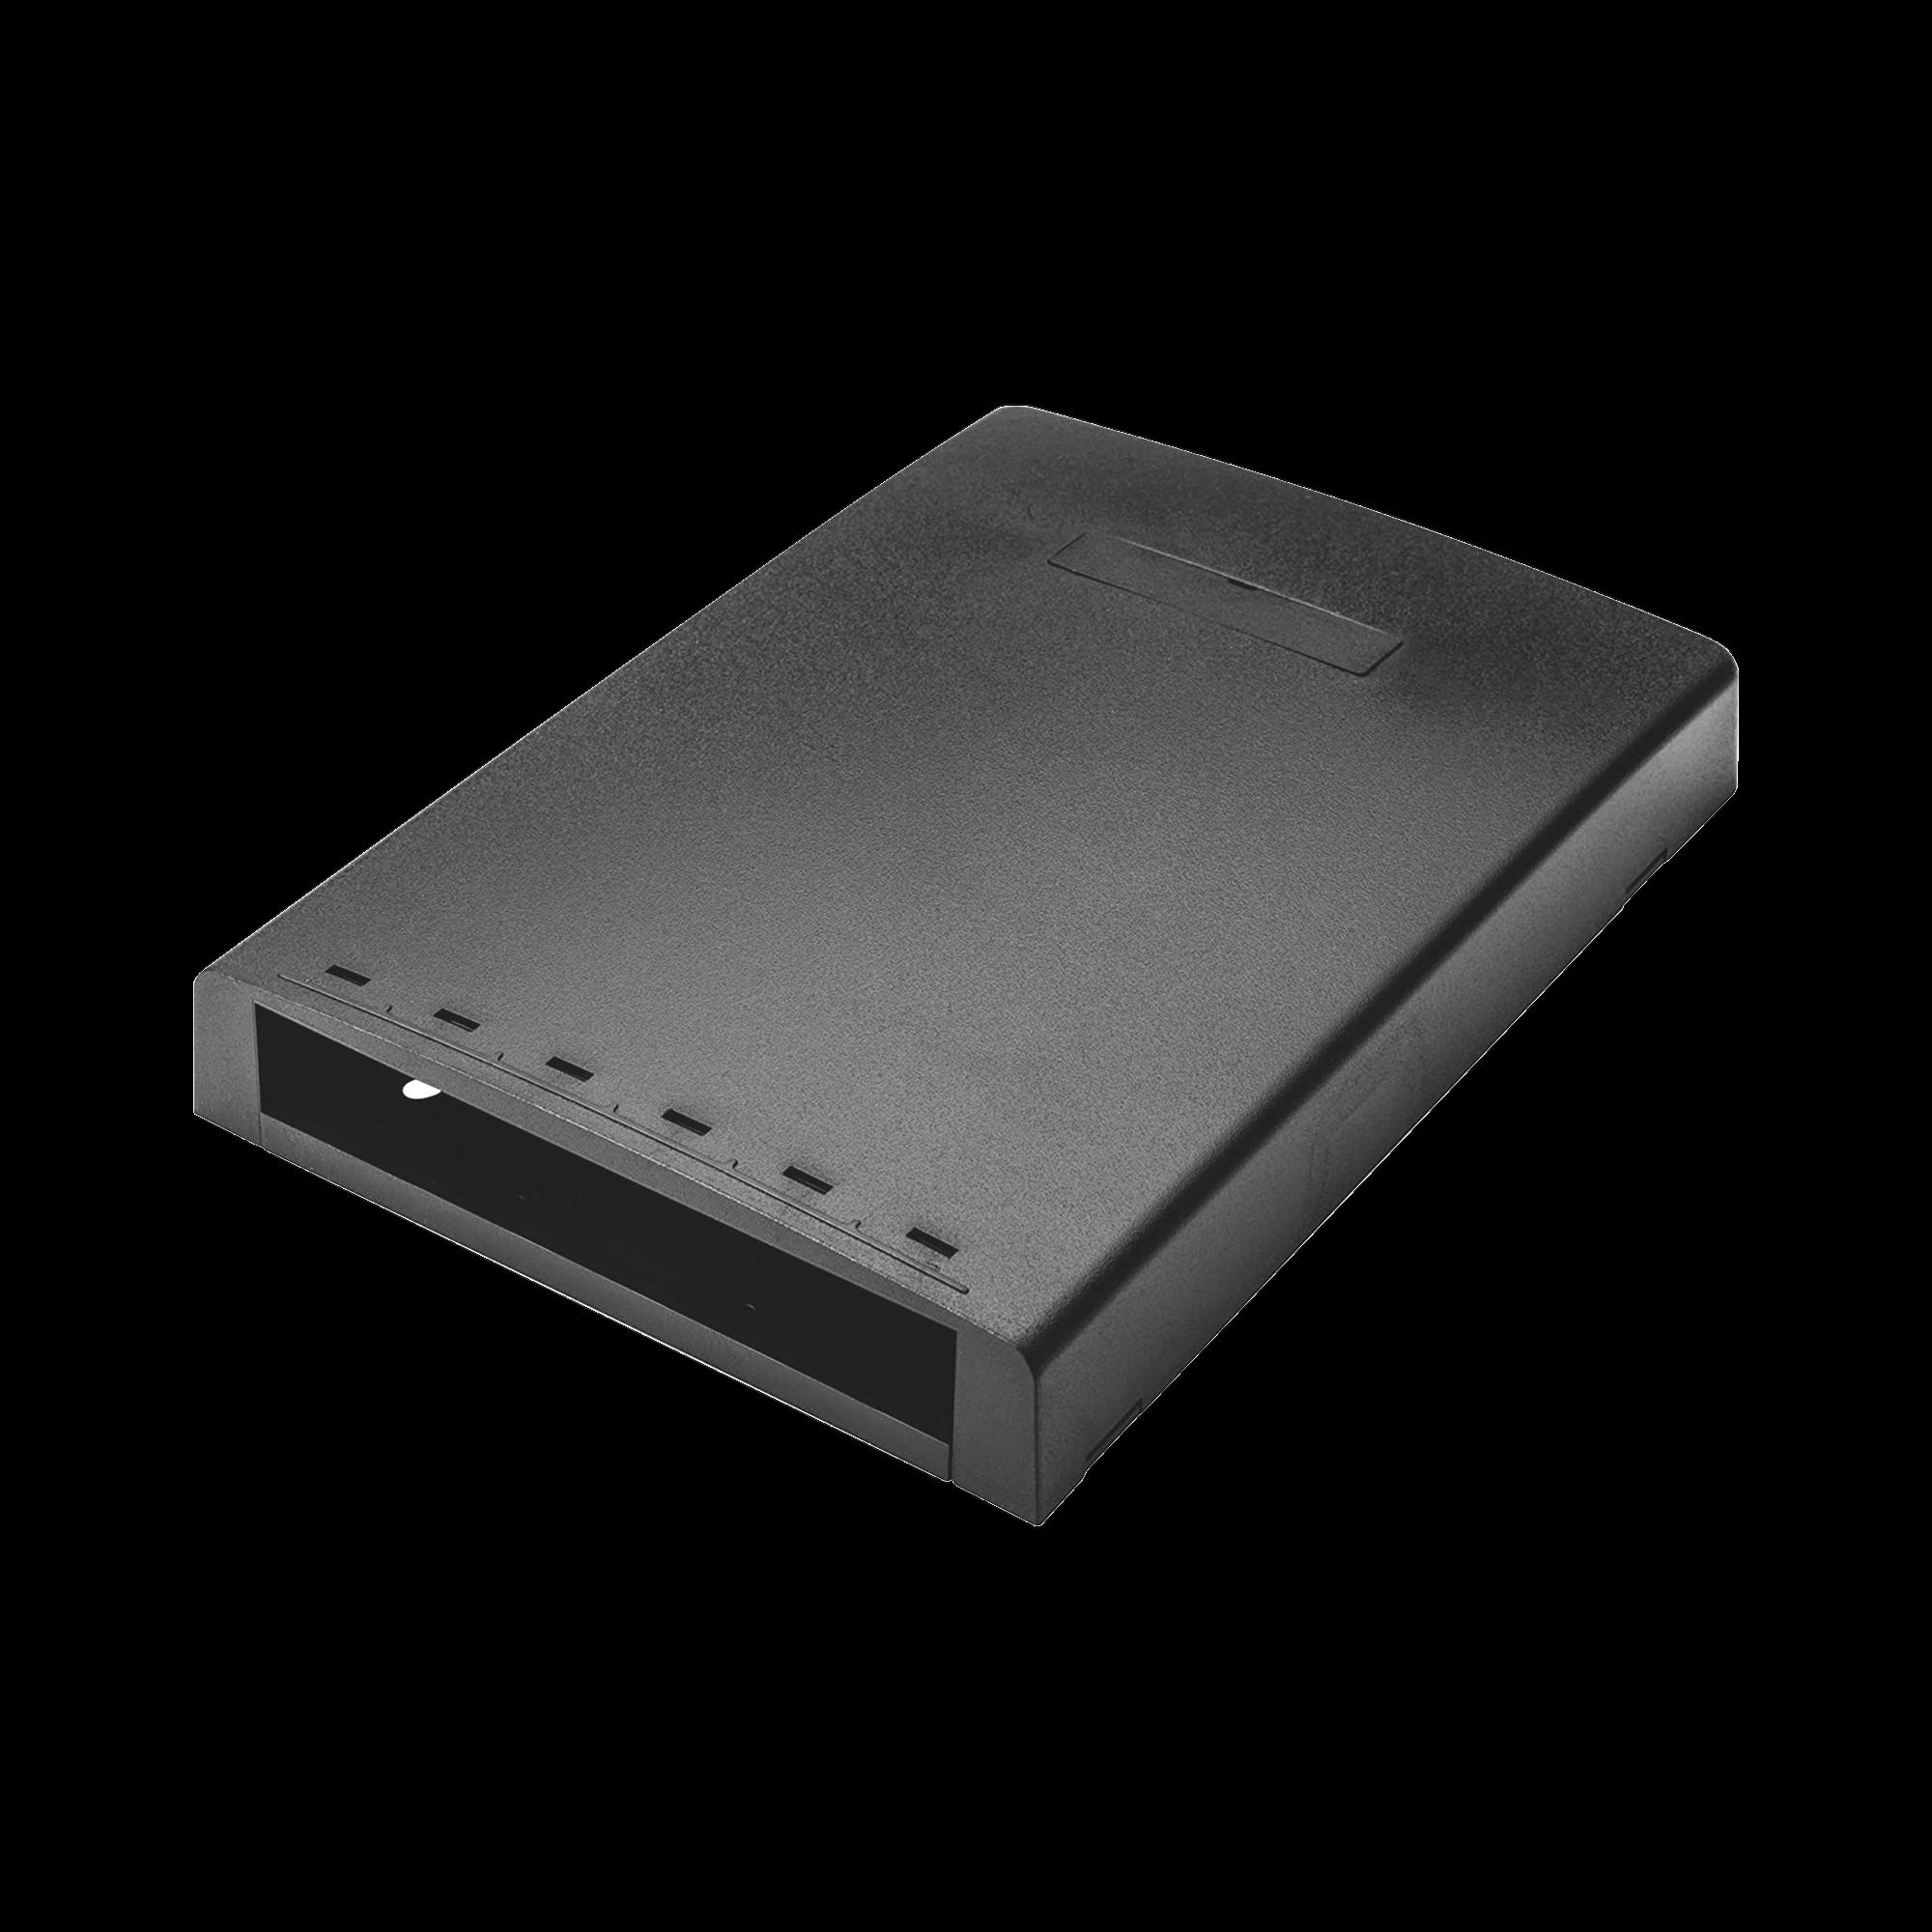 Caja de Montaje en Superficie, Con Accesorio para Resguardo de Fibra optica, Para 6 Modulos Mini-Com, Color Negro